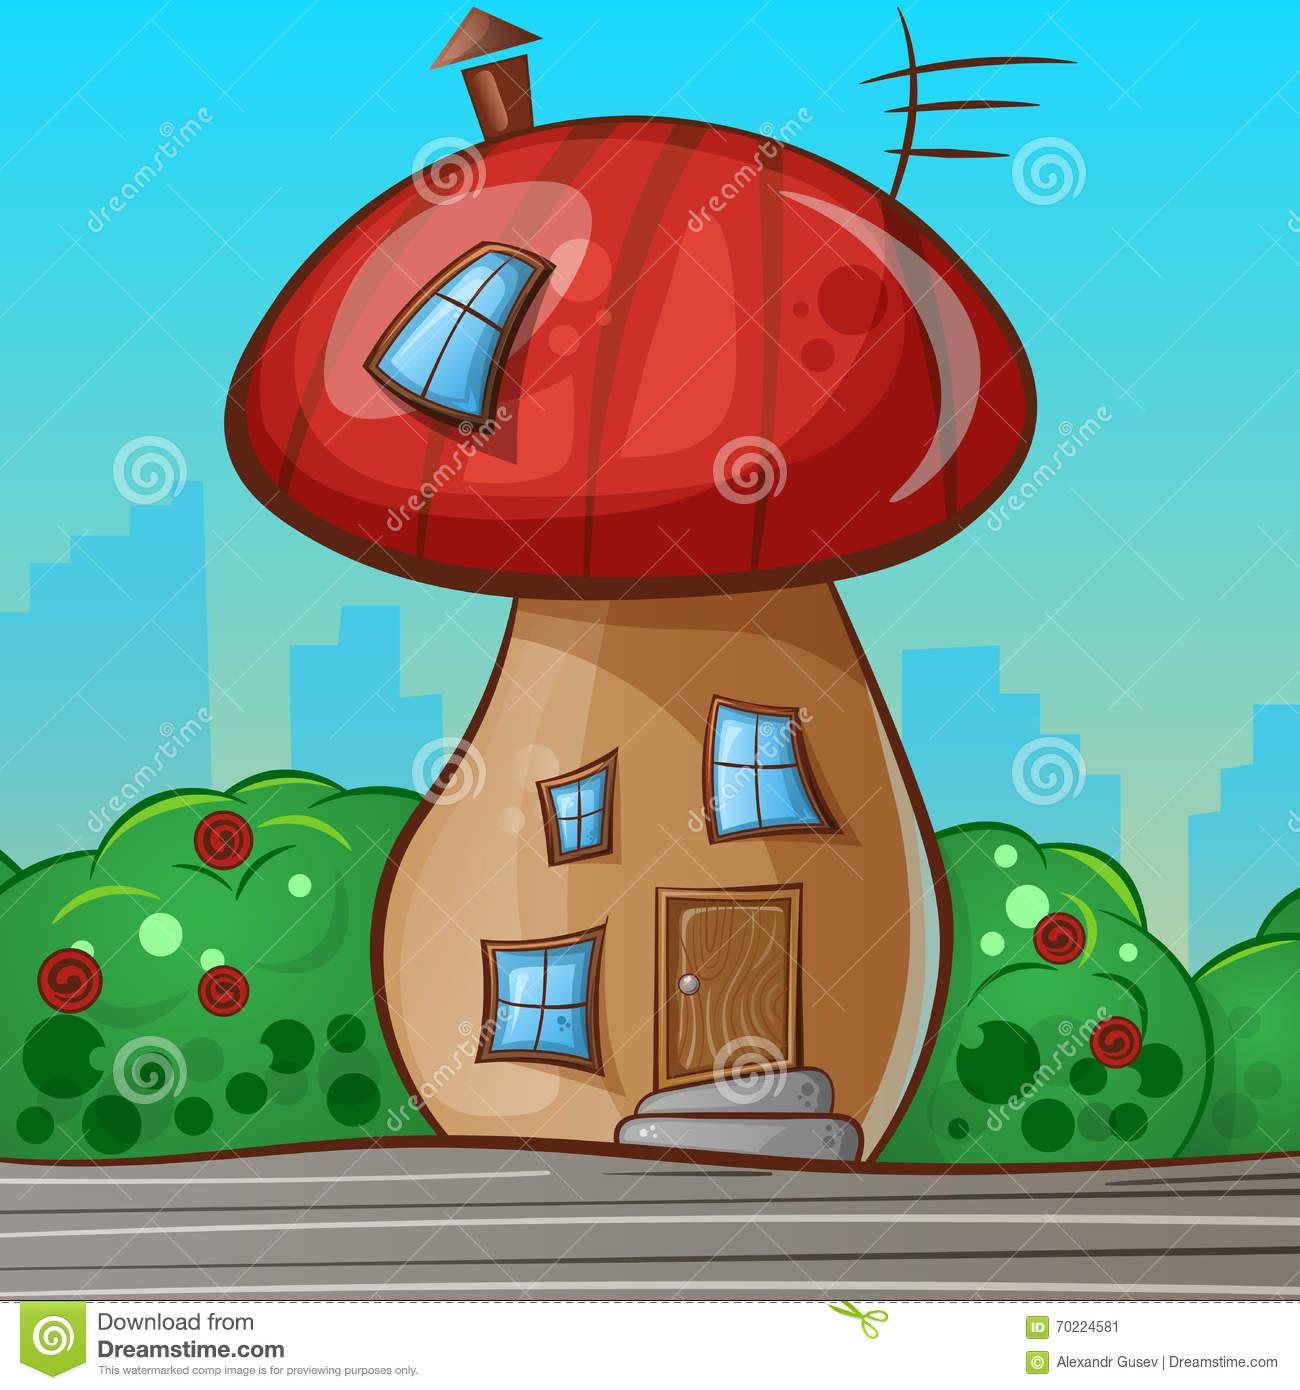 Cartoon House In The Shape Of The Mushroom. Stock Vector.